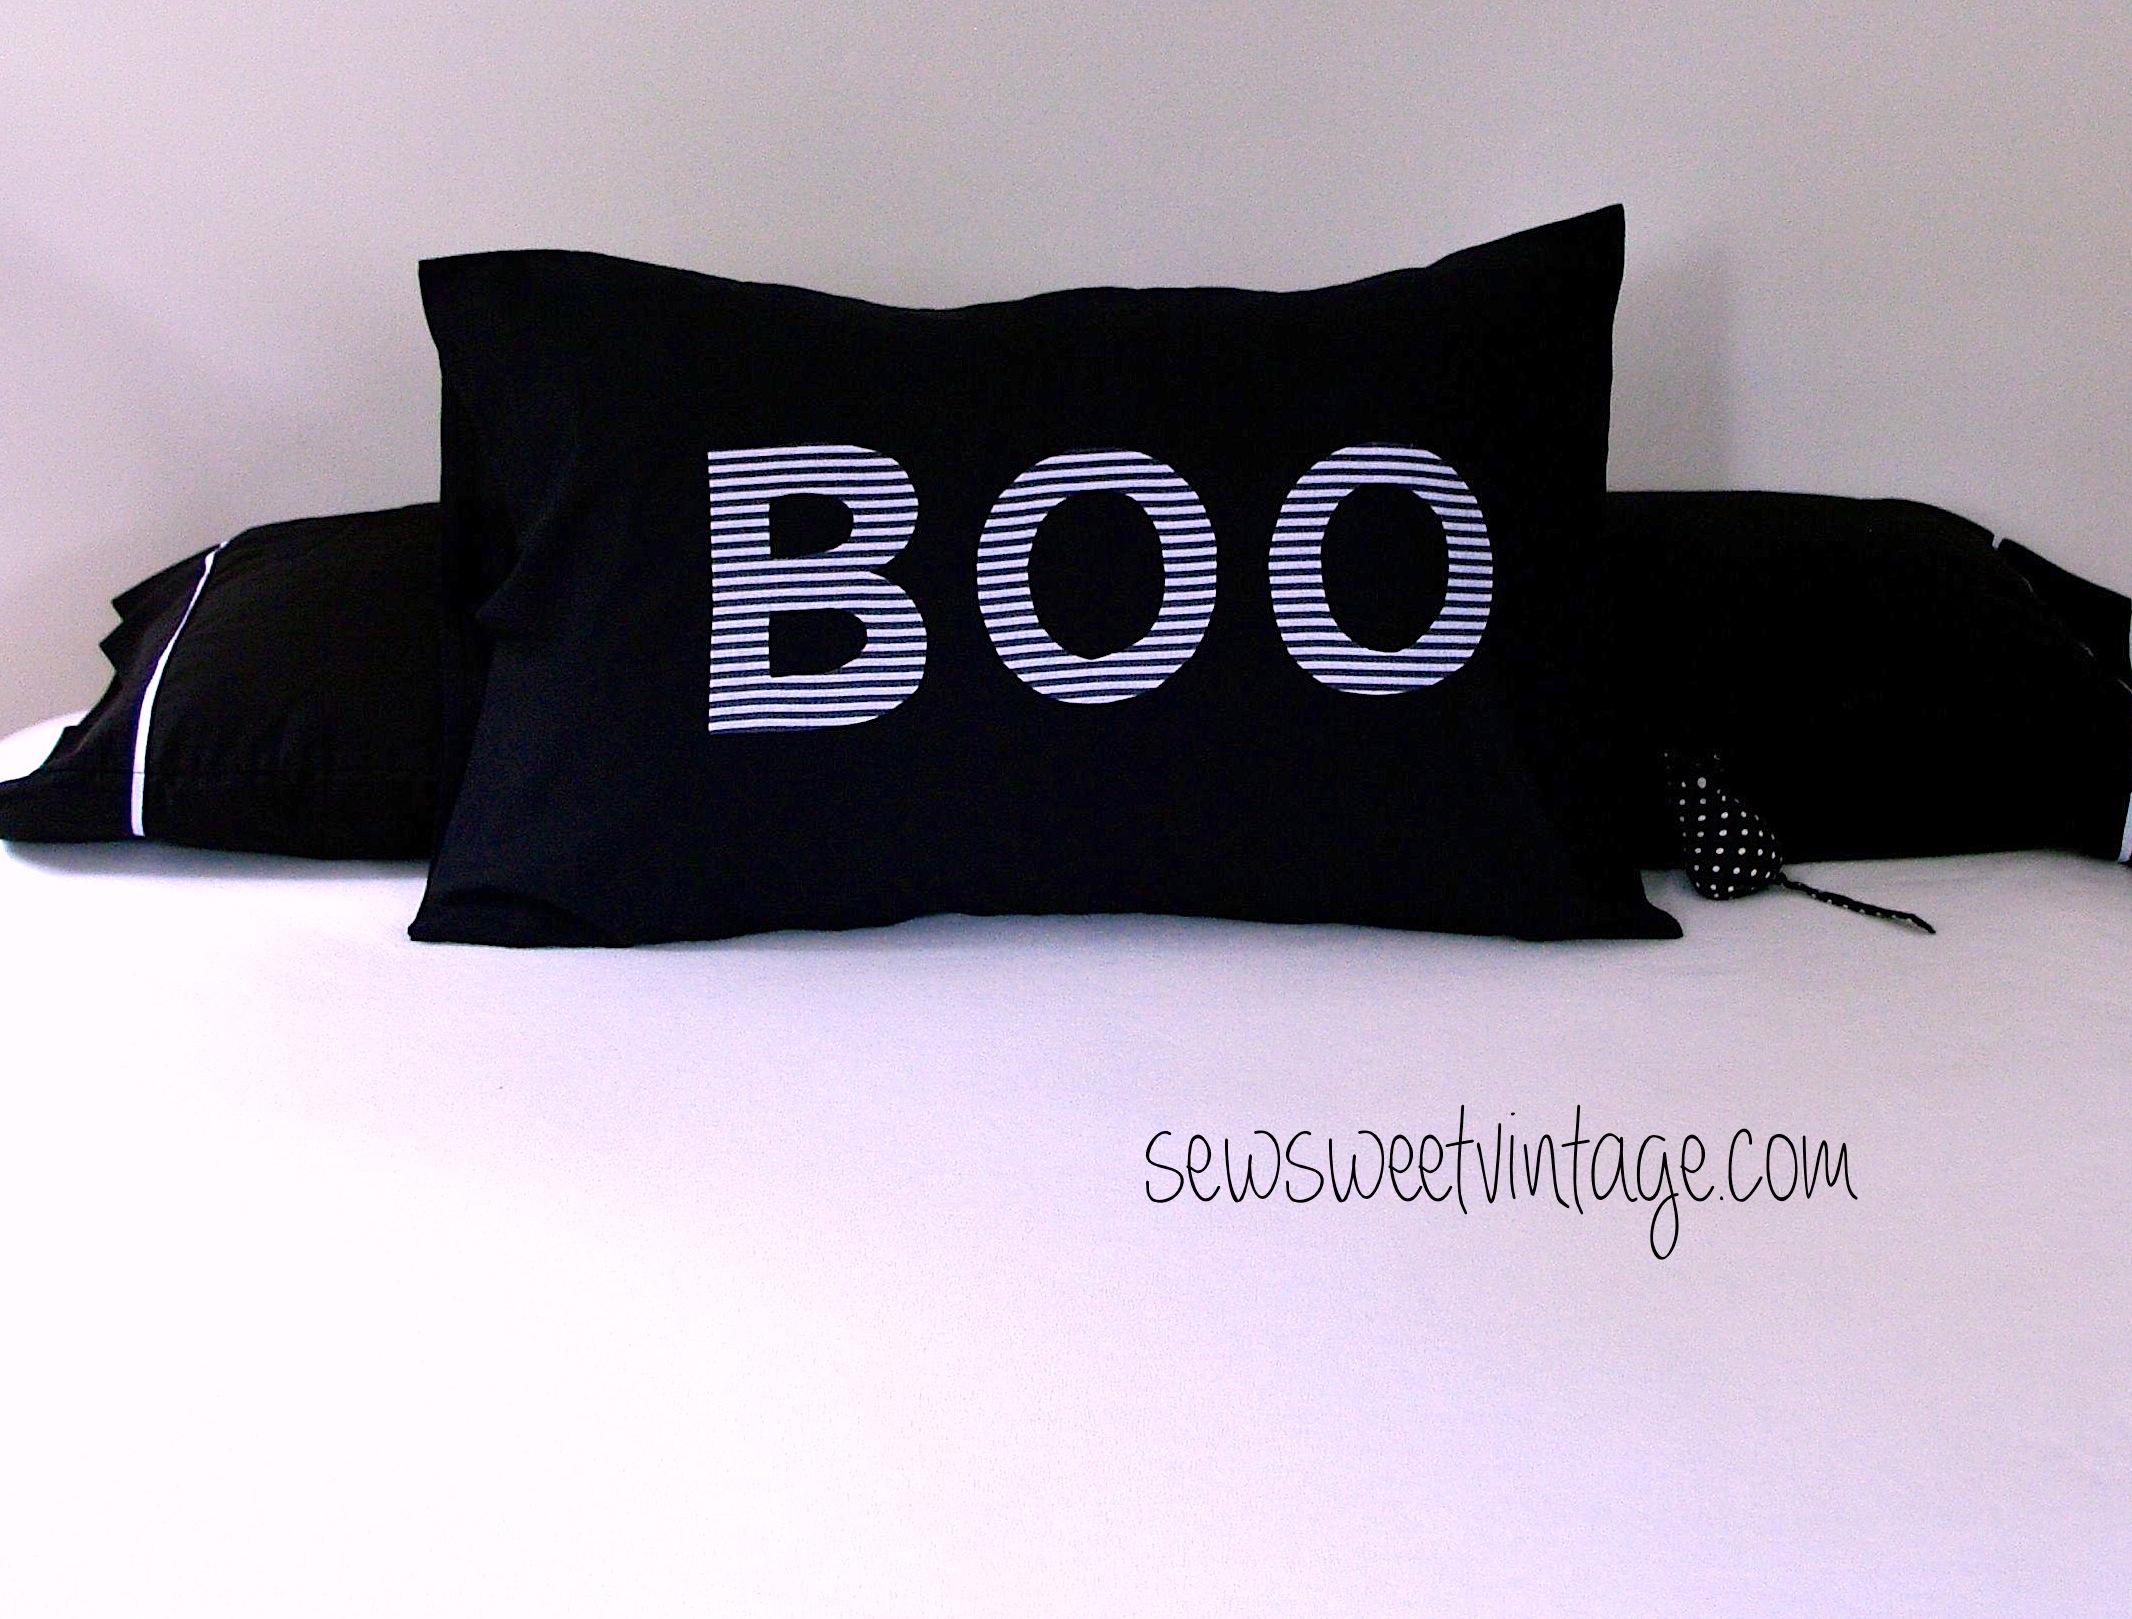 Boo pillowcase